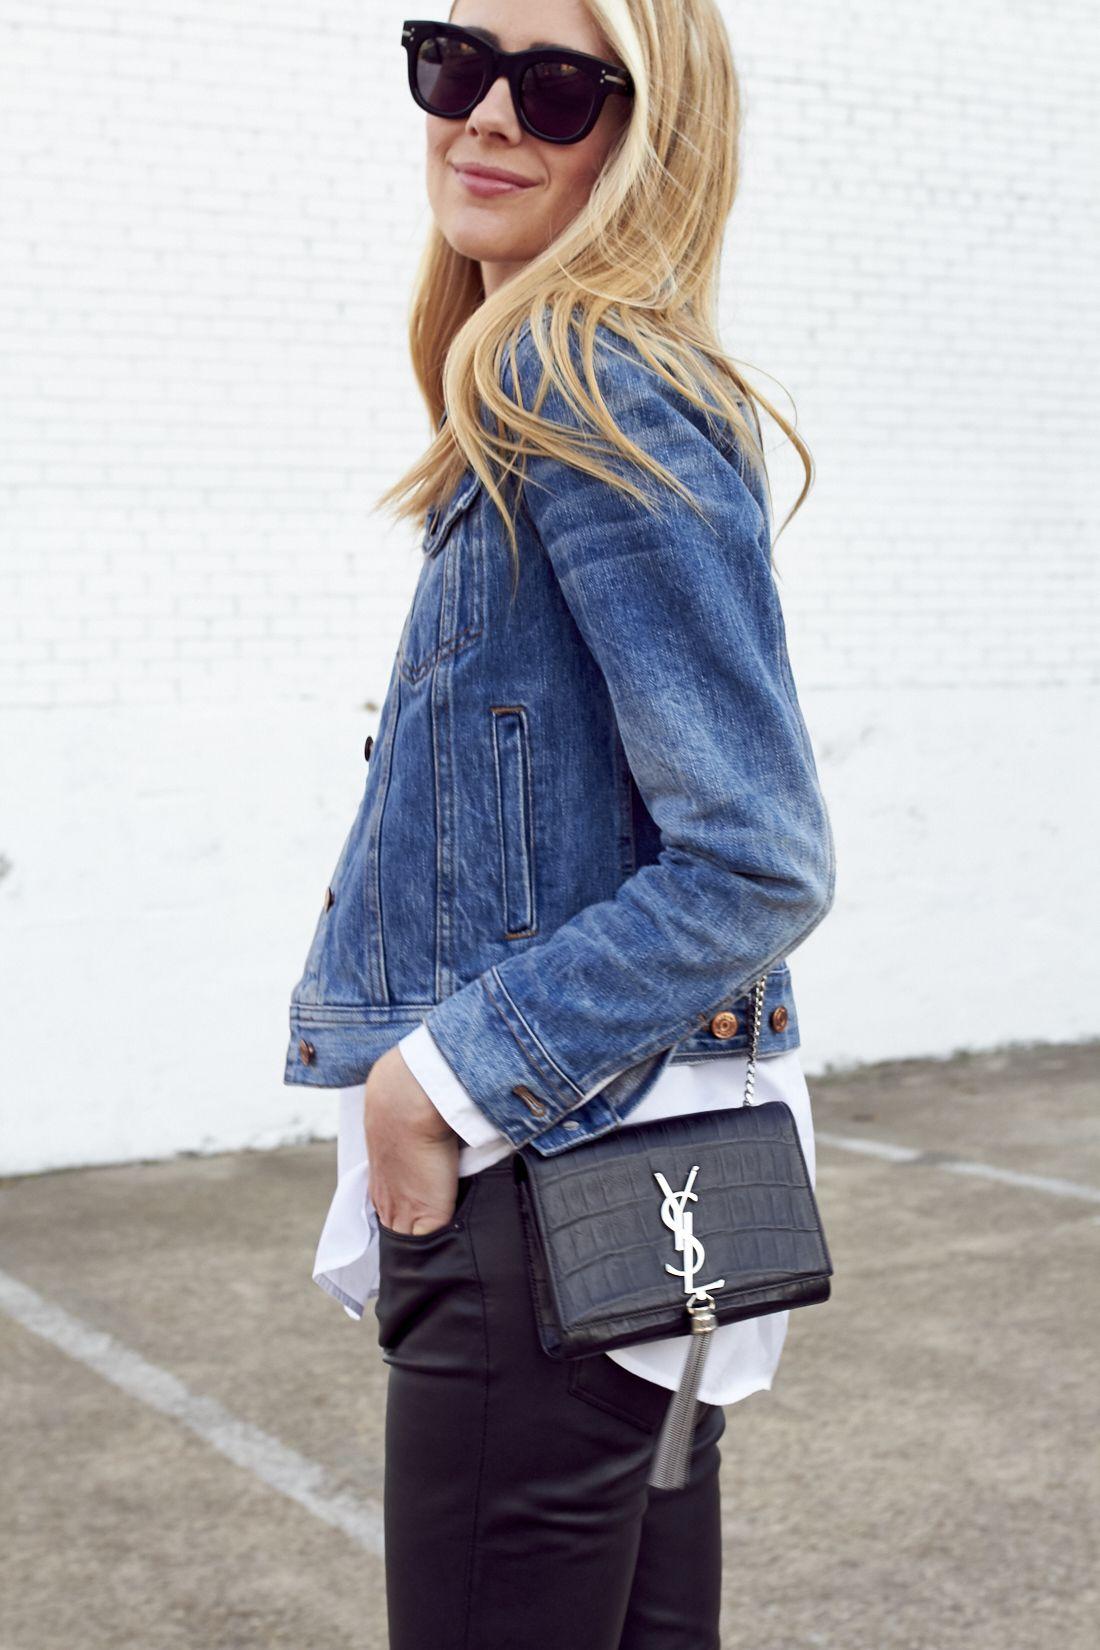 732859a19de fashion-jackson-saint-laurent-monogram-handbag-denim-jacket-celine- sunglasses